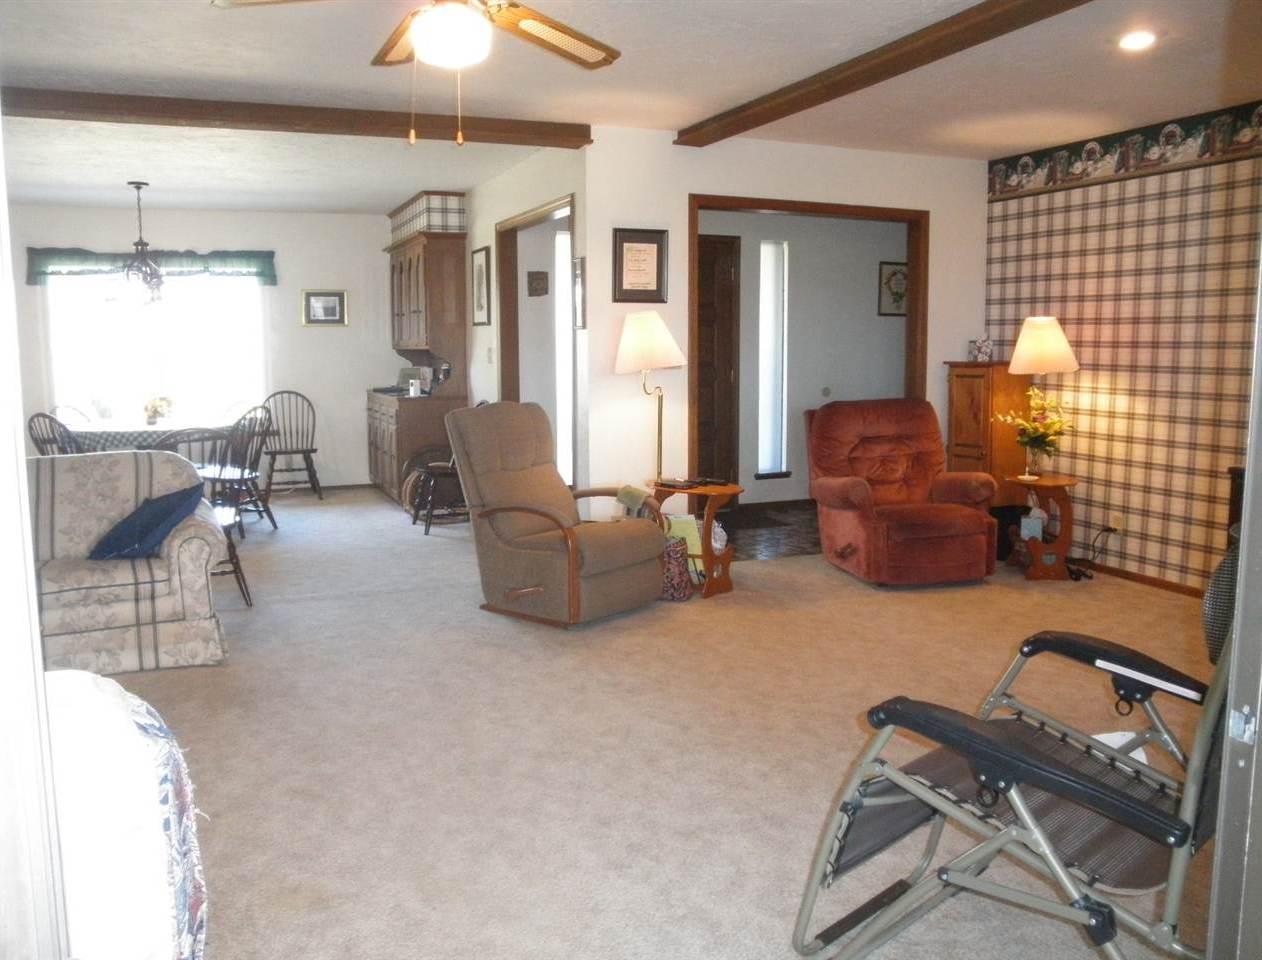 Sold Cross Sale W/ MLS | 1275 S Enterprise Road  Ponca City, OK 74604 6